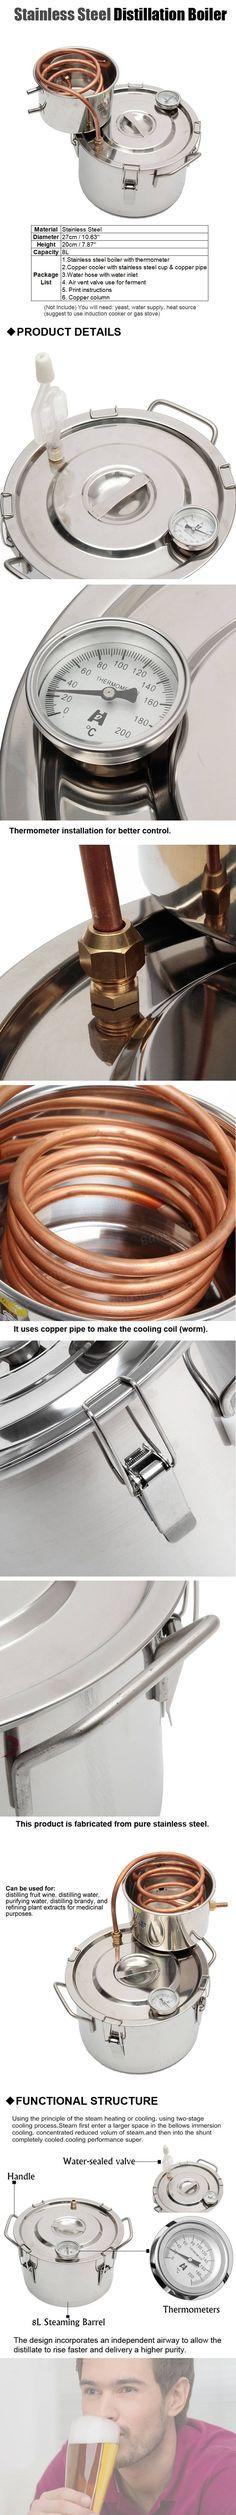 2GAL/8L Copper Ethanol Water Alcohol Distiller Moonshine Still Stainless Steel Distillation Boiler at Banggood